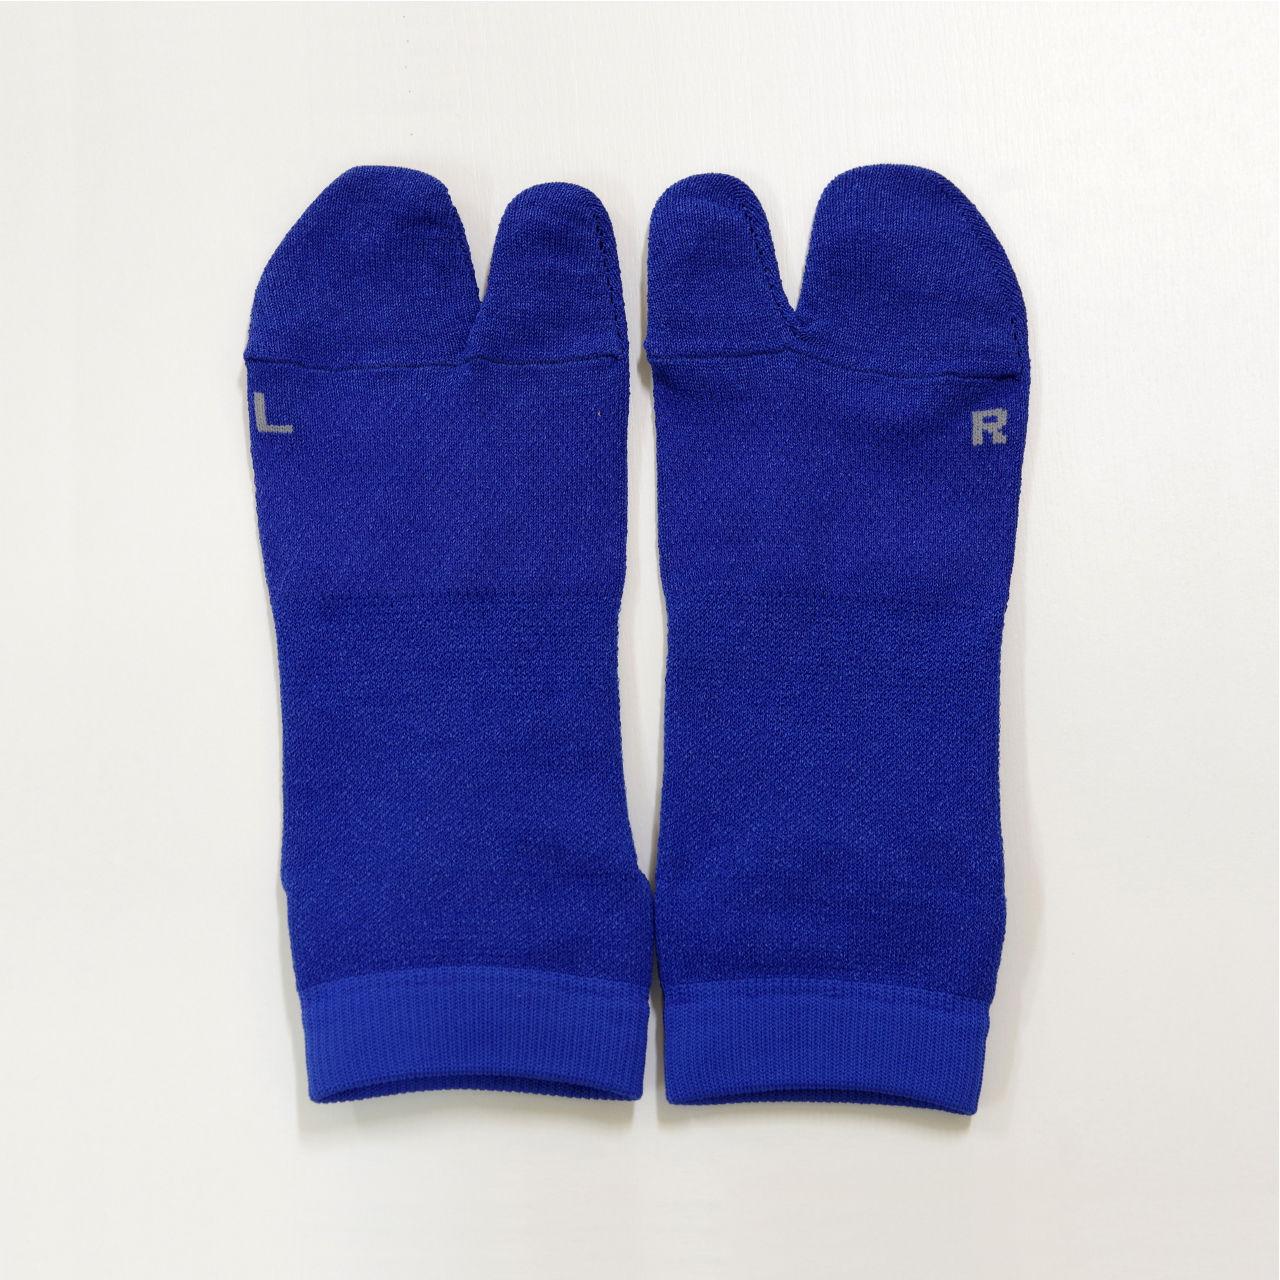 IDATEN足袋コンプレッション和紙ソックスショート丈(Lサイズ26-28cm)